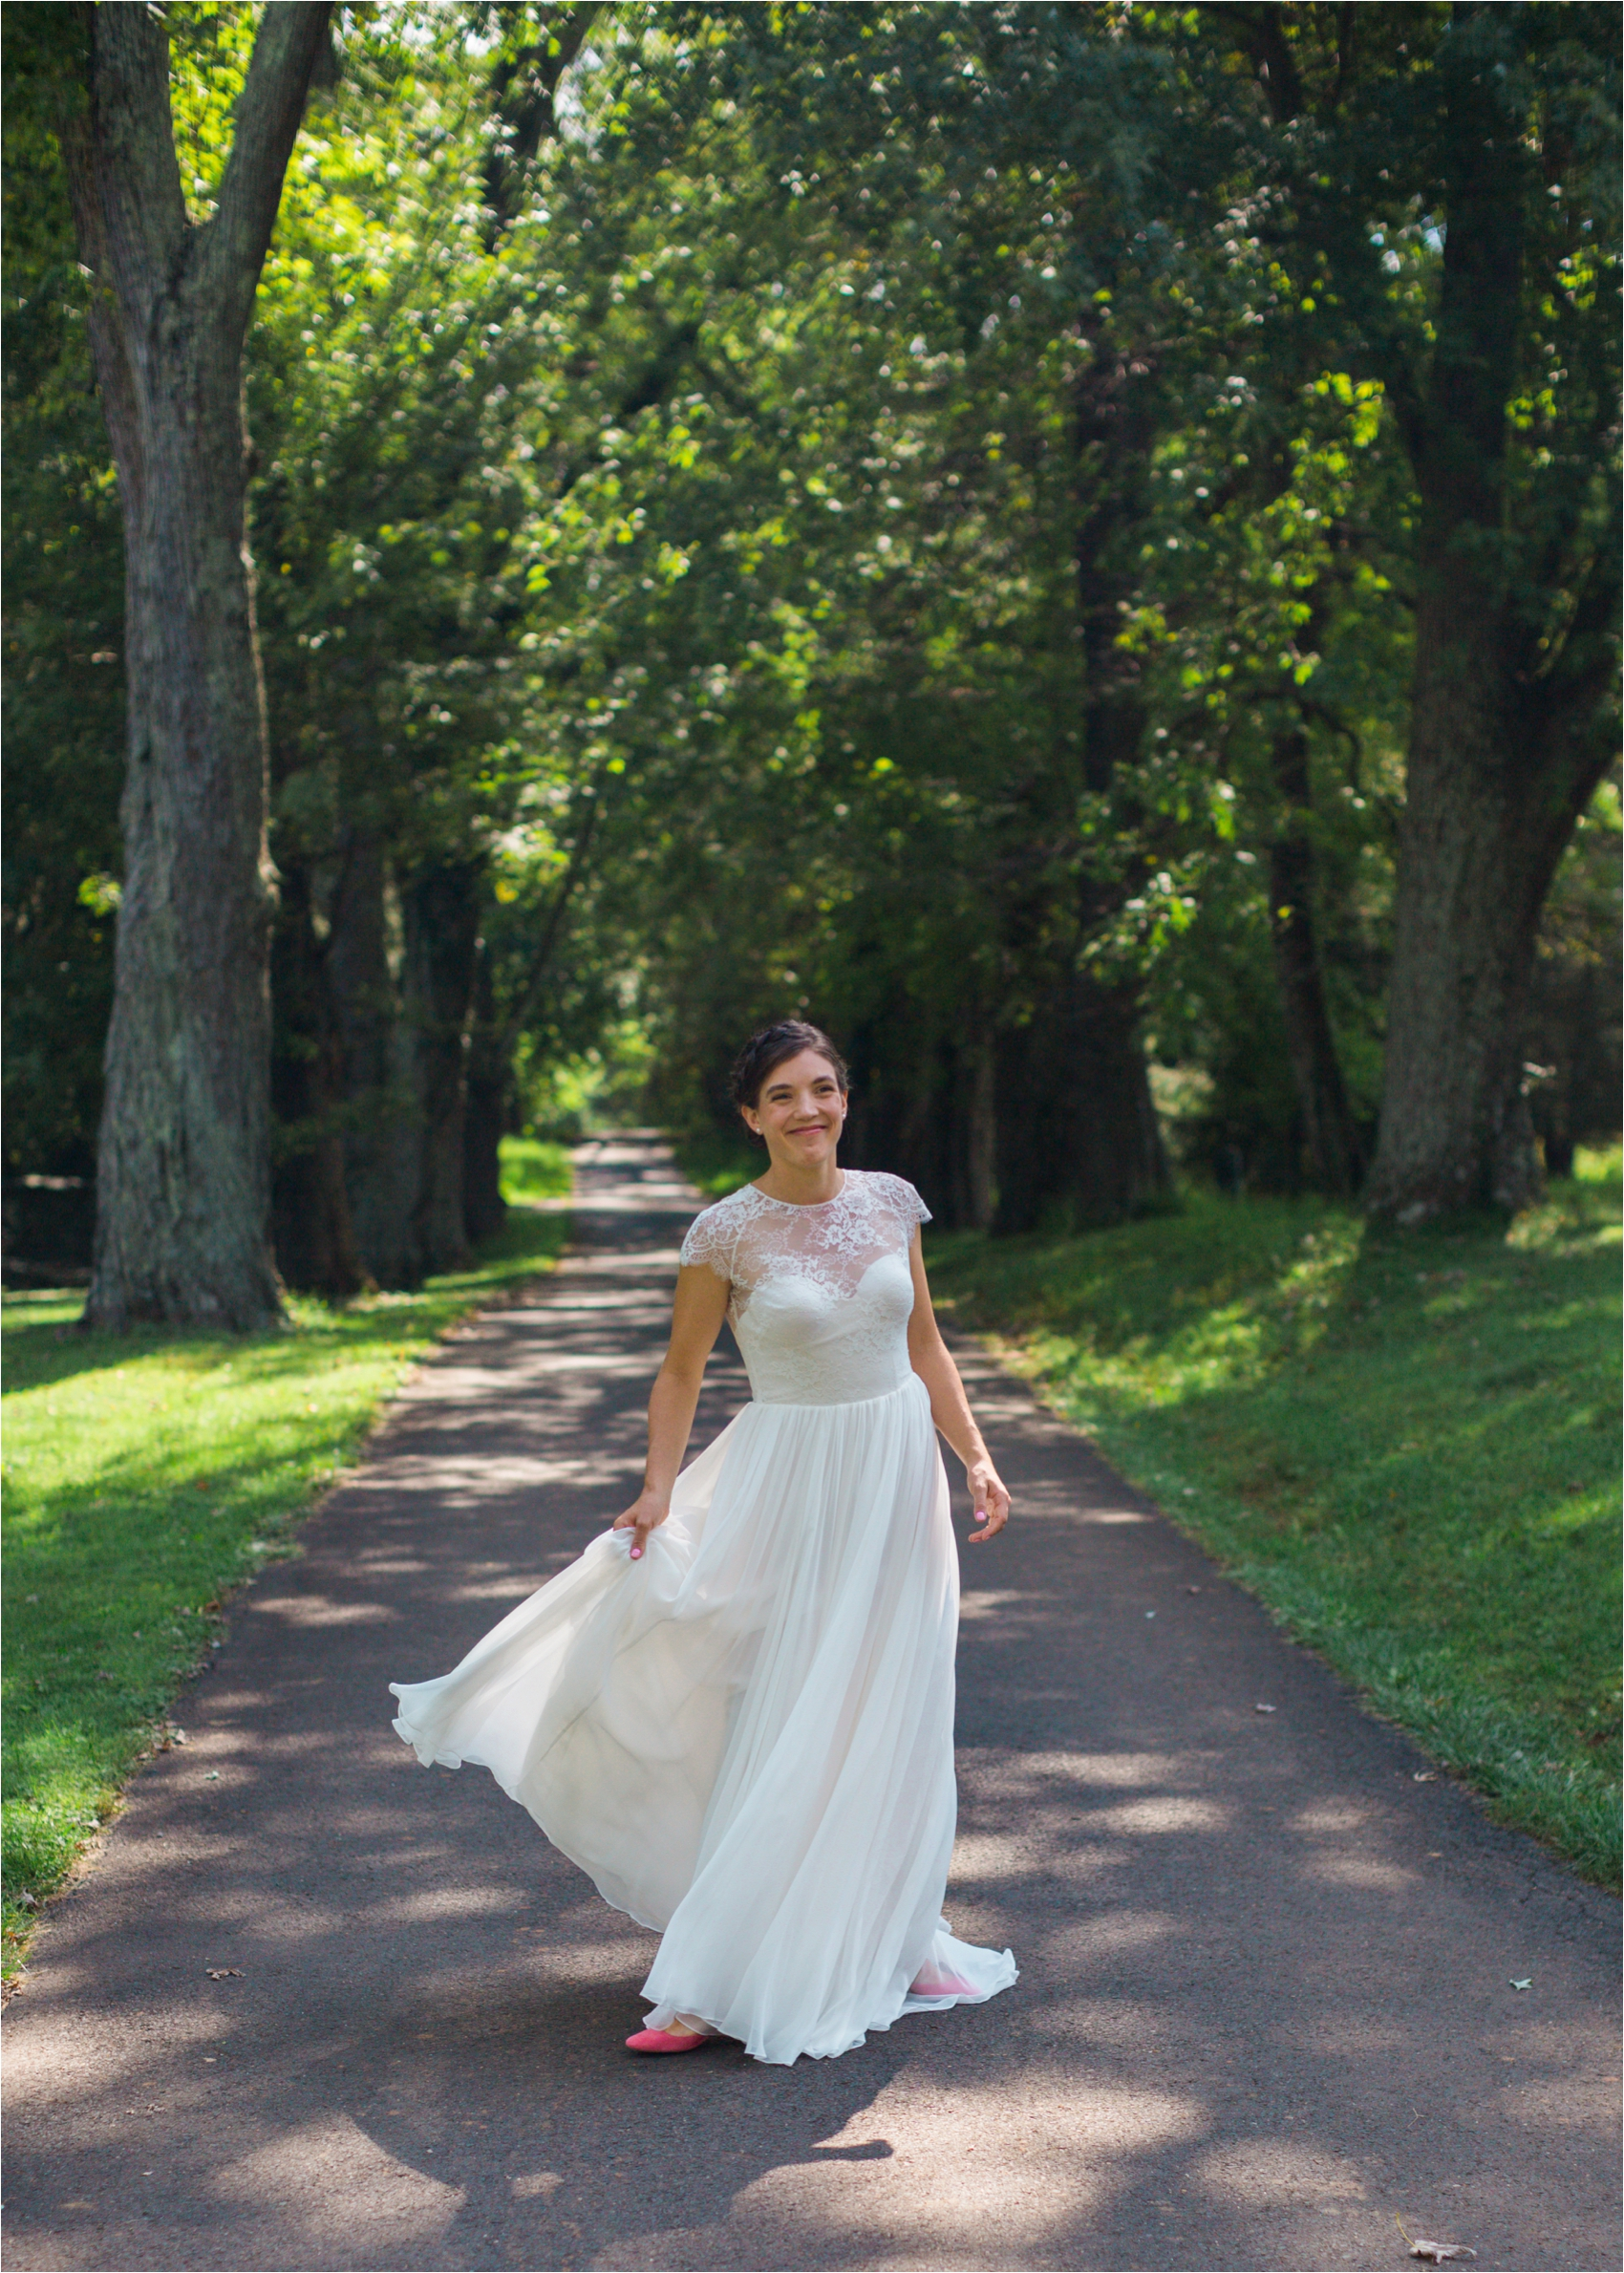 Feather-and-Oak-Rainforest-Trust-Virginia-Wedding-0119.jpg